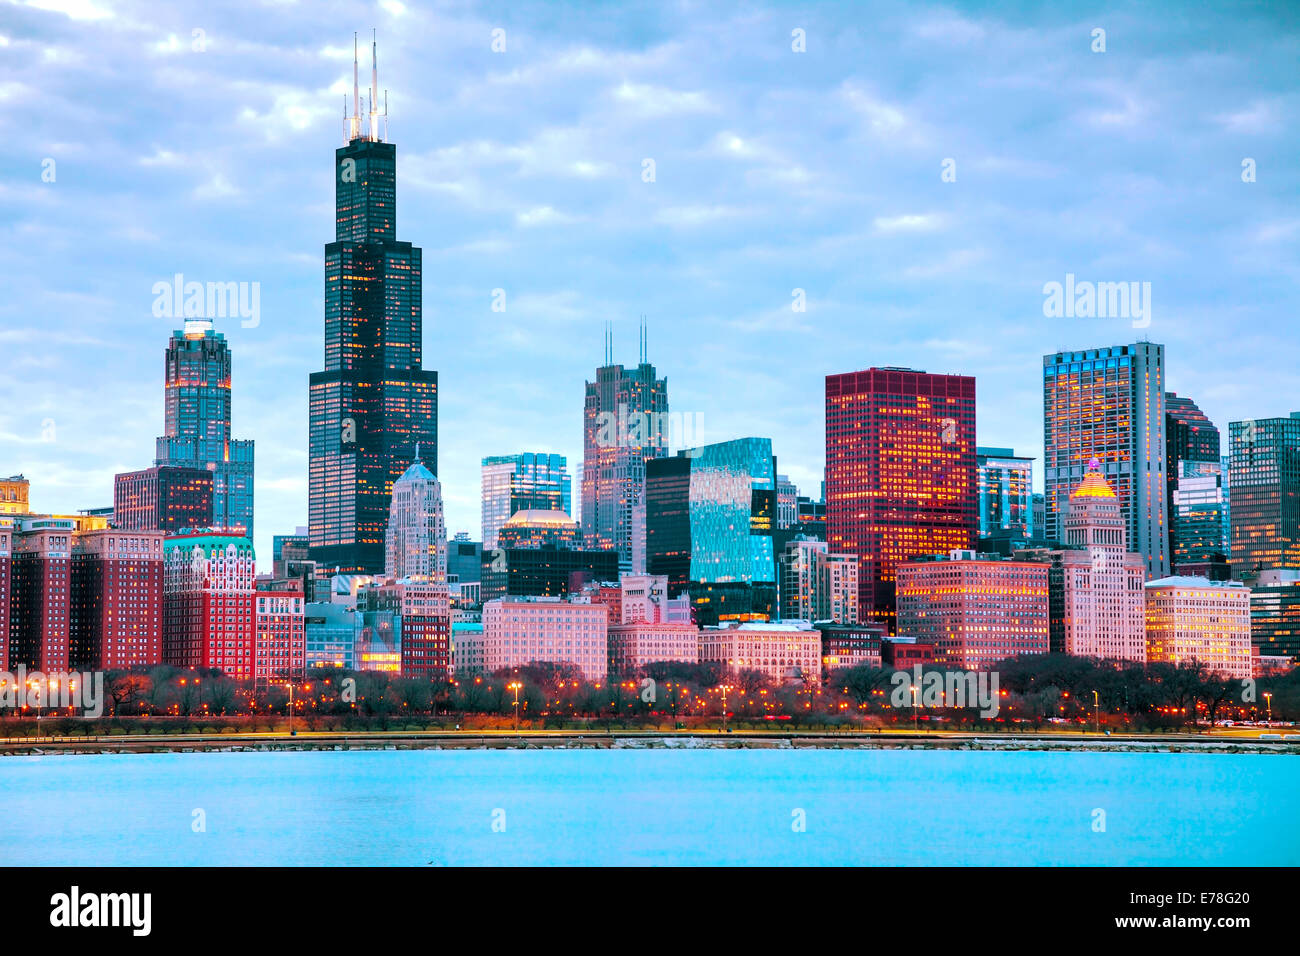 Chicago Downtown paisaje al atardecer Imagen De Stock